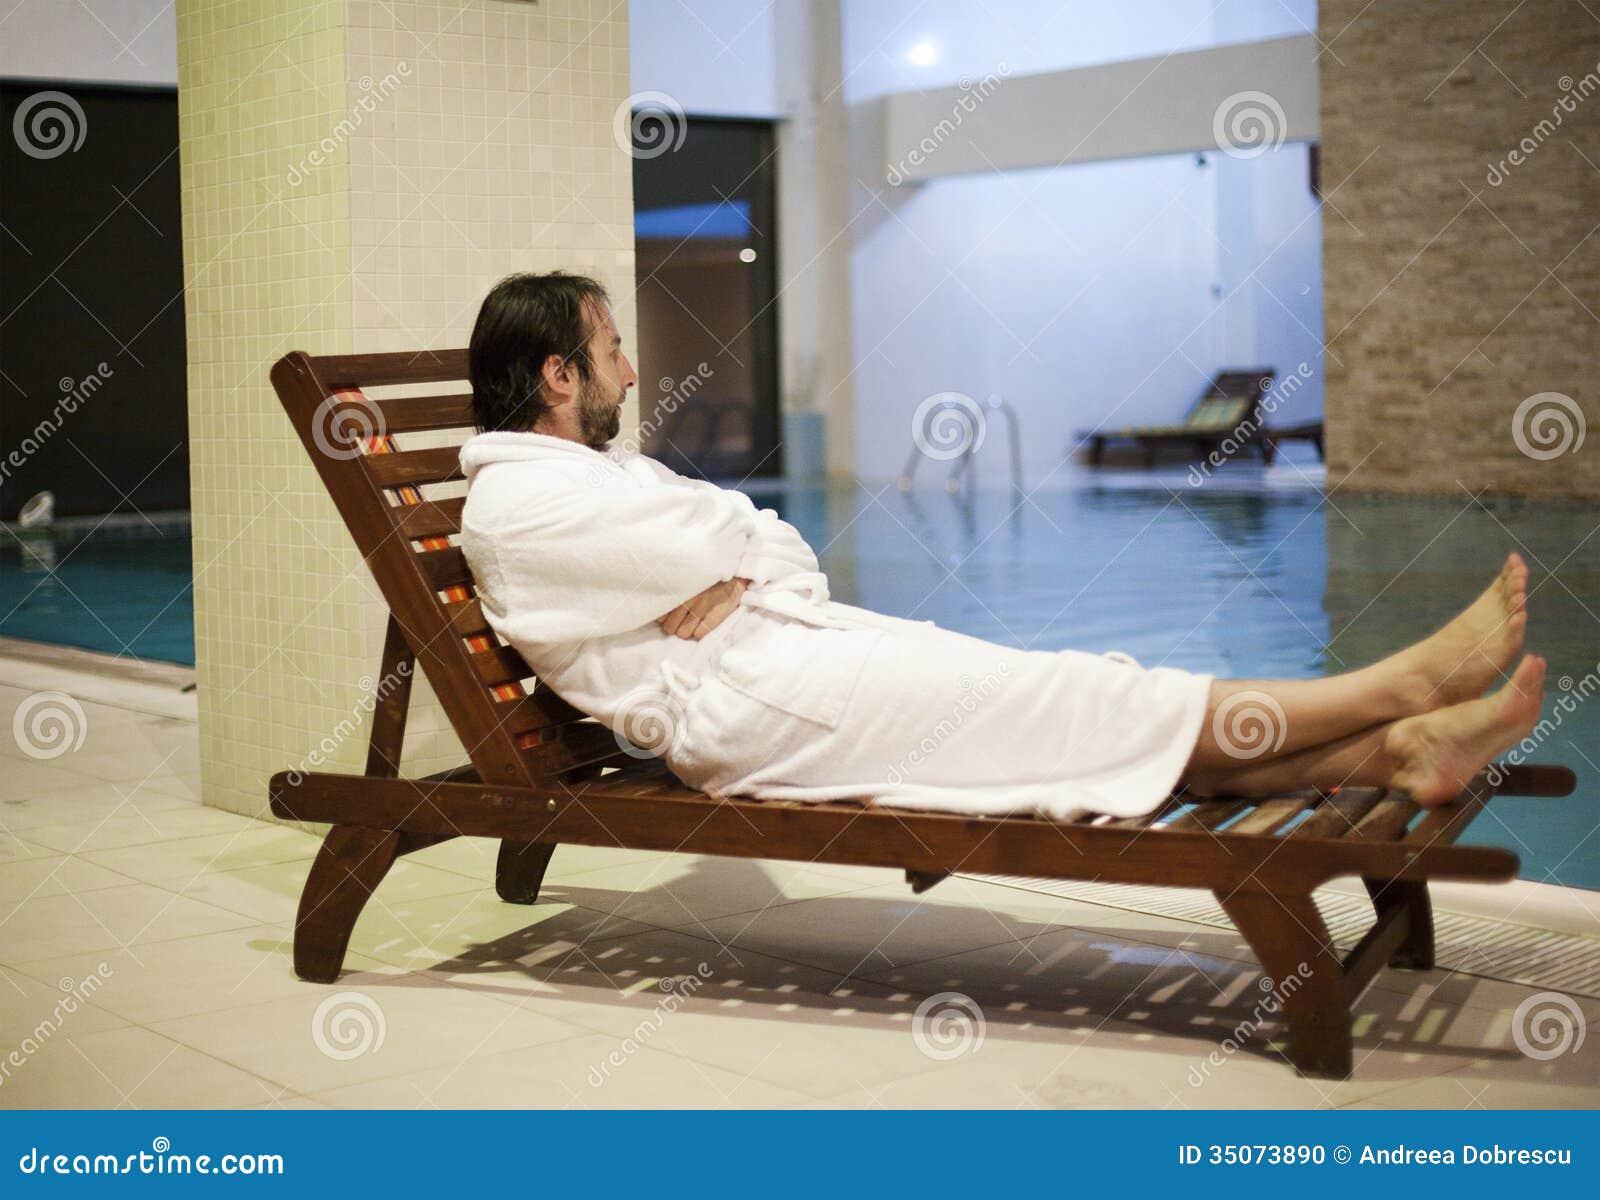 Man At The Spa Center Stock Photo Image 35073890